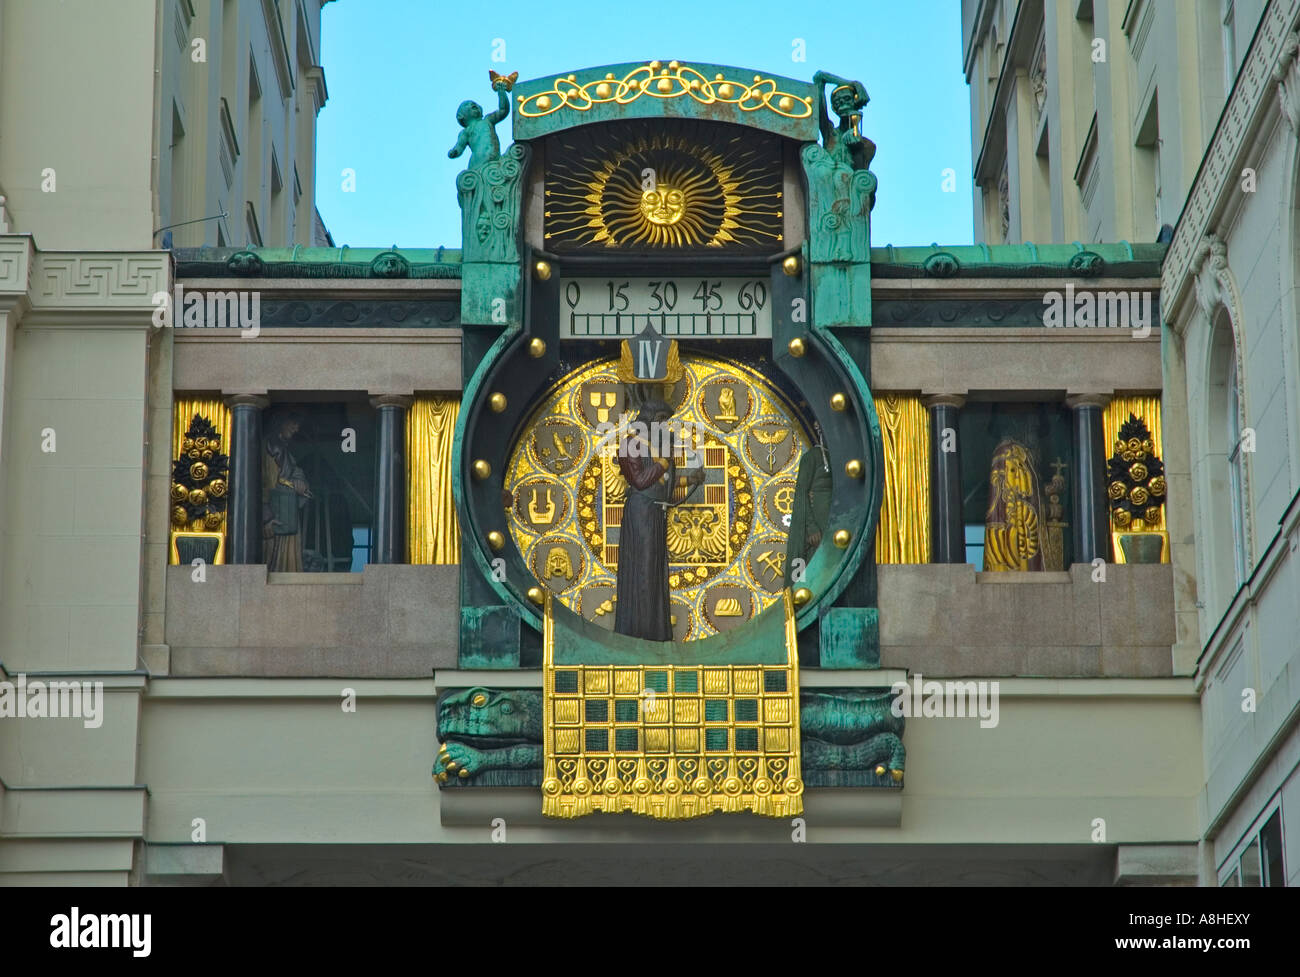 Ankeruhr the so called Anchor clock in Hohermarkt square in Vienna Austria EU Stock Photo